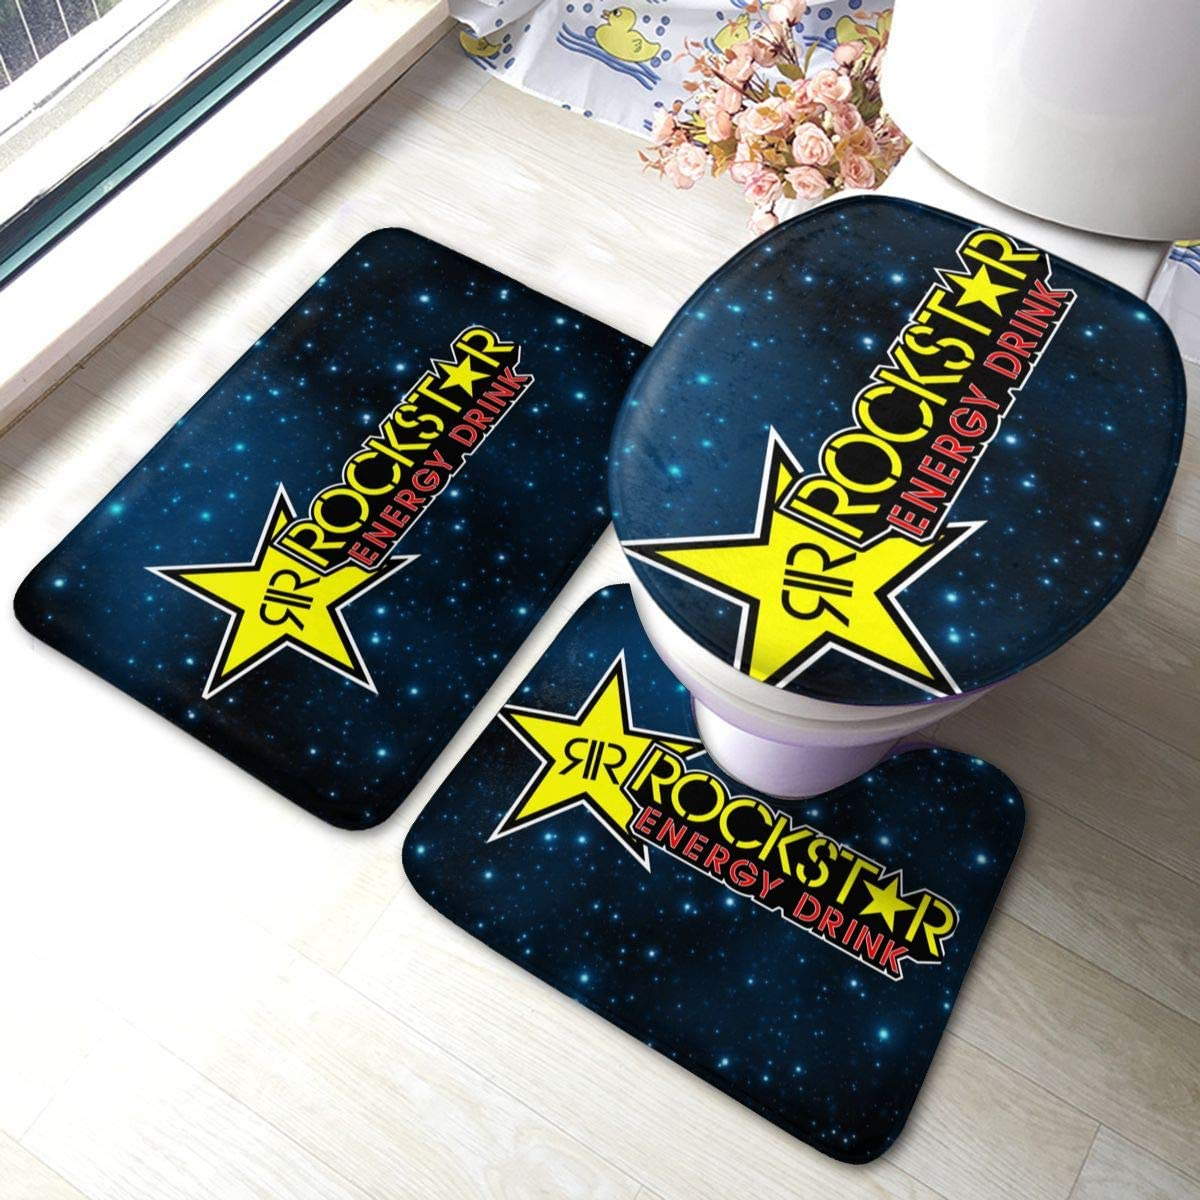 HowaWler Rockstar Energy Drink Super Soft Door Mat Non-Slip Bathroom Carpet Entrance Mat Set of 3